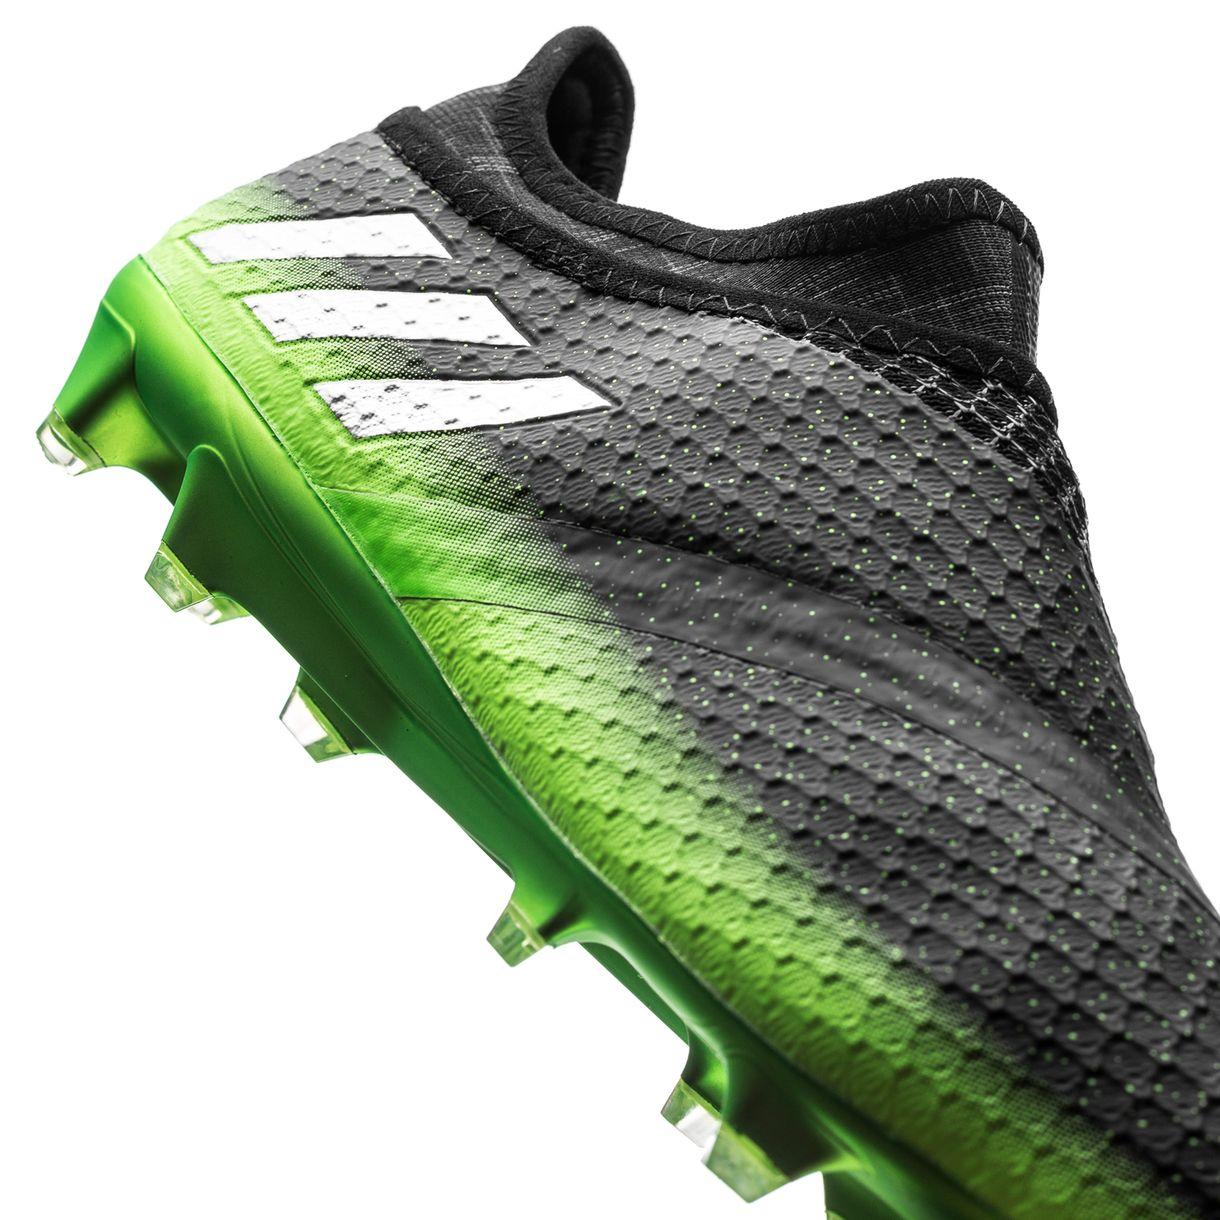 23c71d02e ... Click to enlarge image  adidas_messi_16_pureagility_fg_ag_space_dust_dark_grey_silver_metallic_solar_green_j.jpg  ...